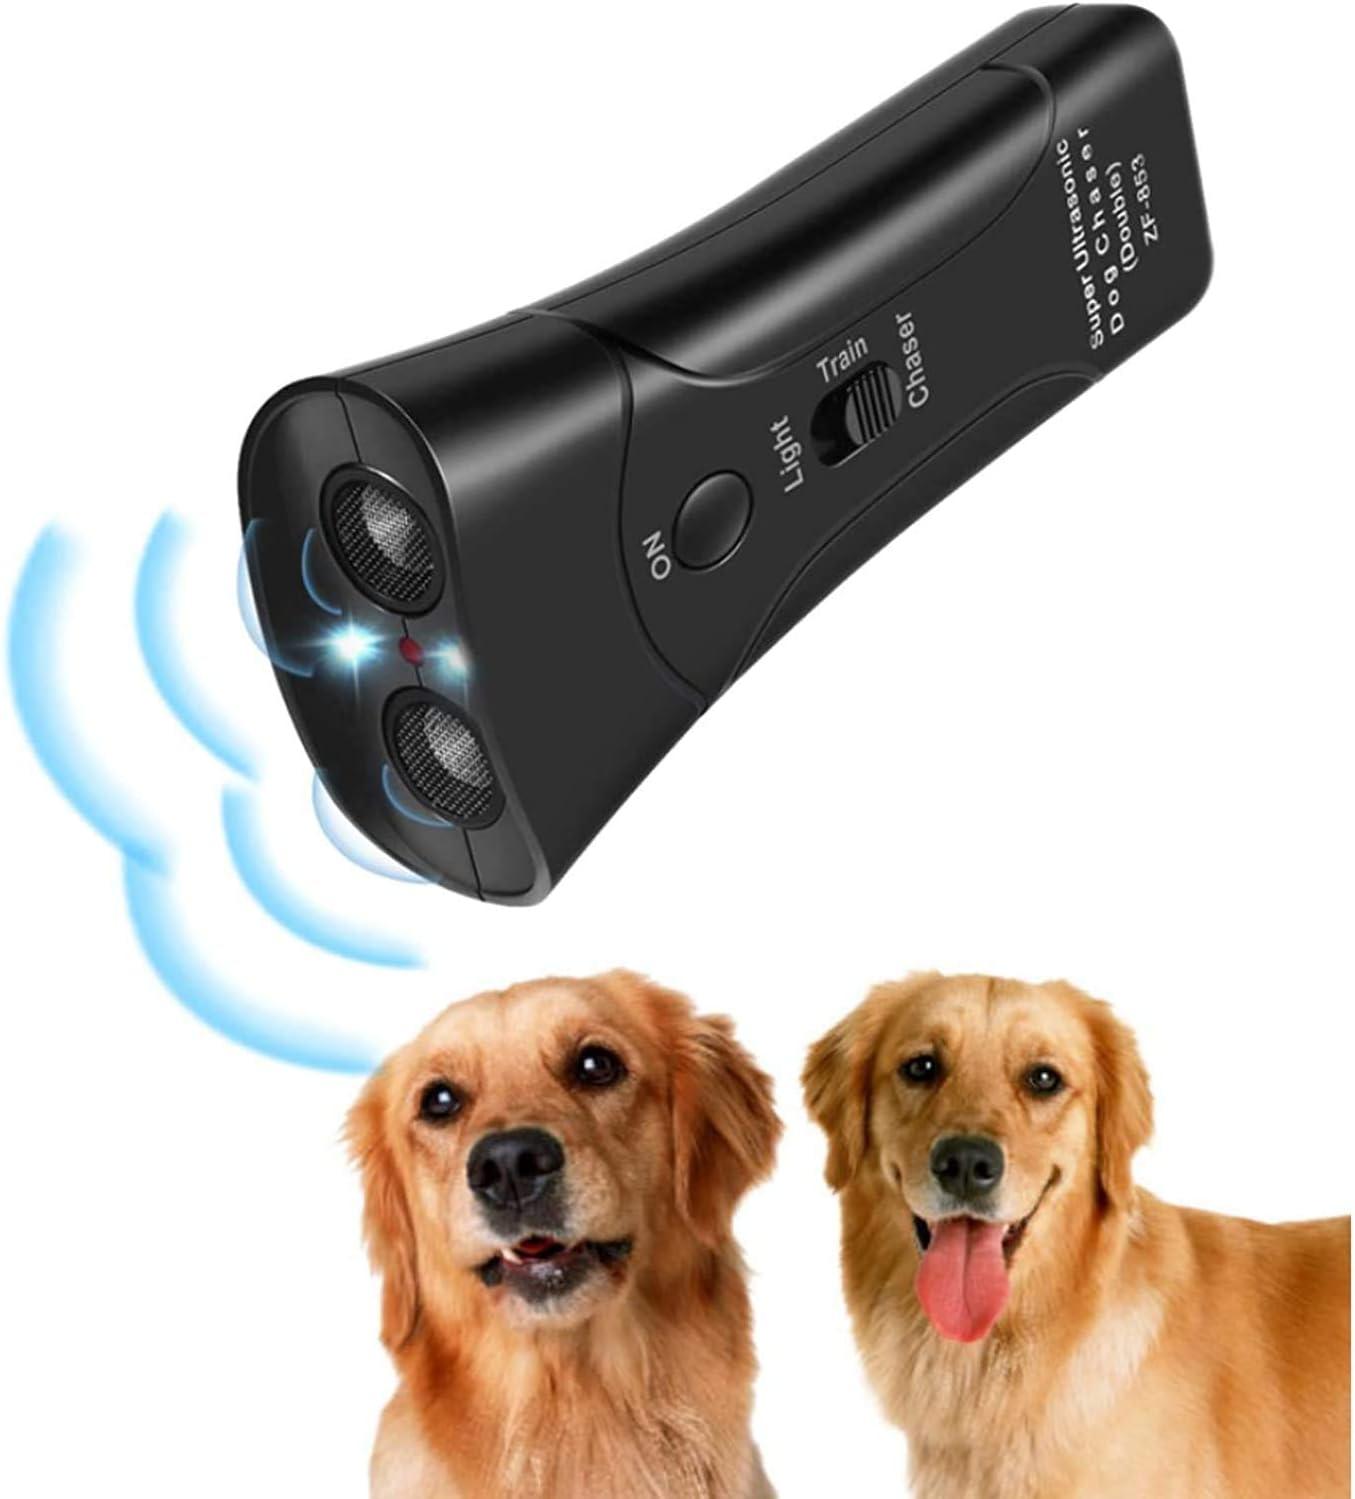 YANCEN Cheap SALE Start Anti Barking Device Ultrasonic 3 Max 84% OFF Deterrent Dog